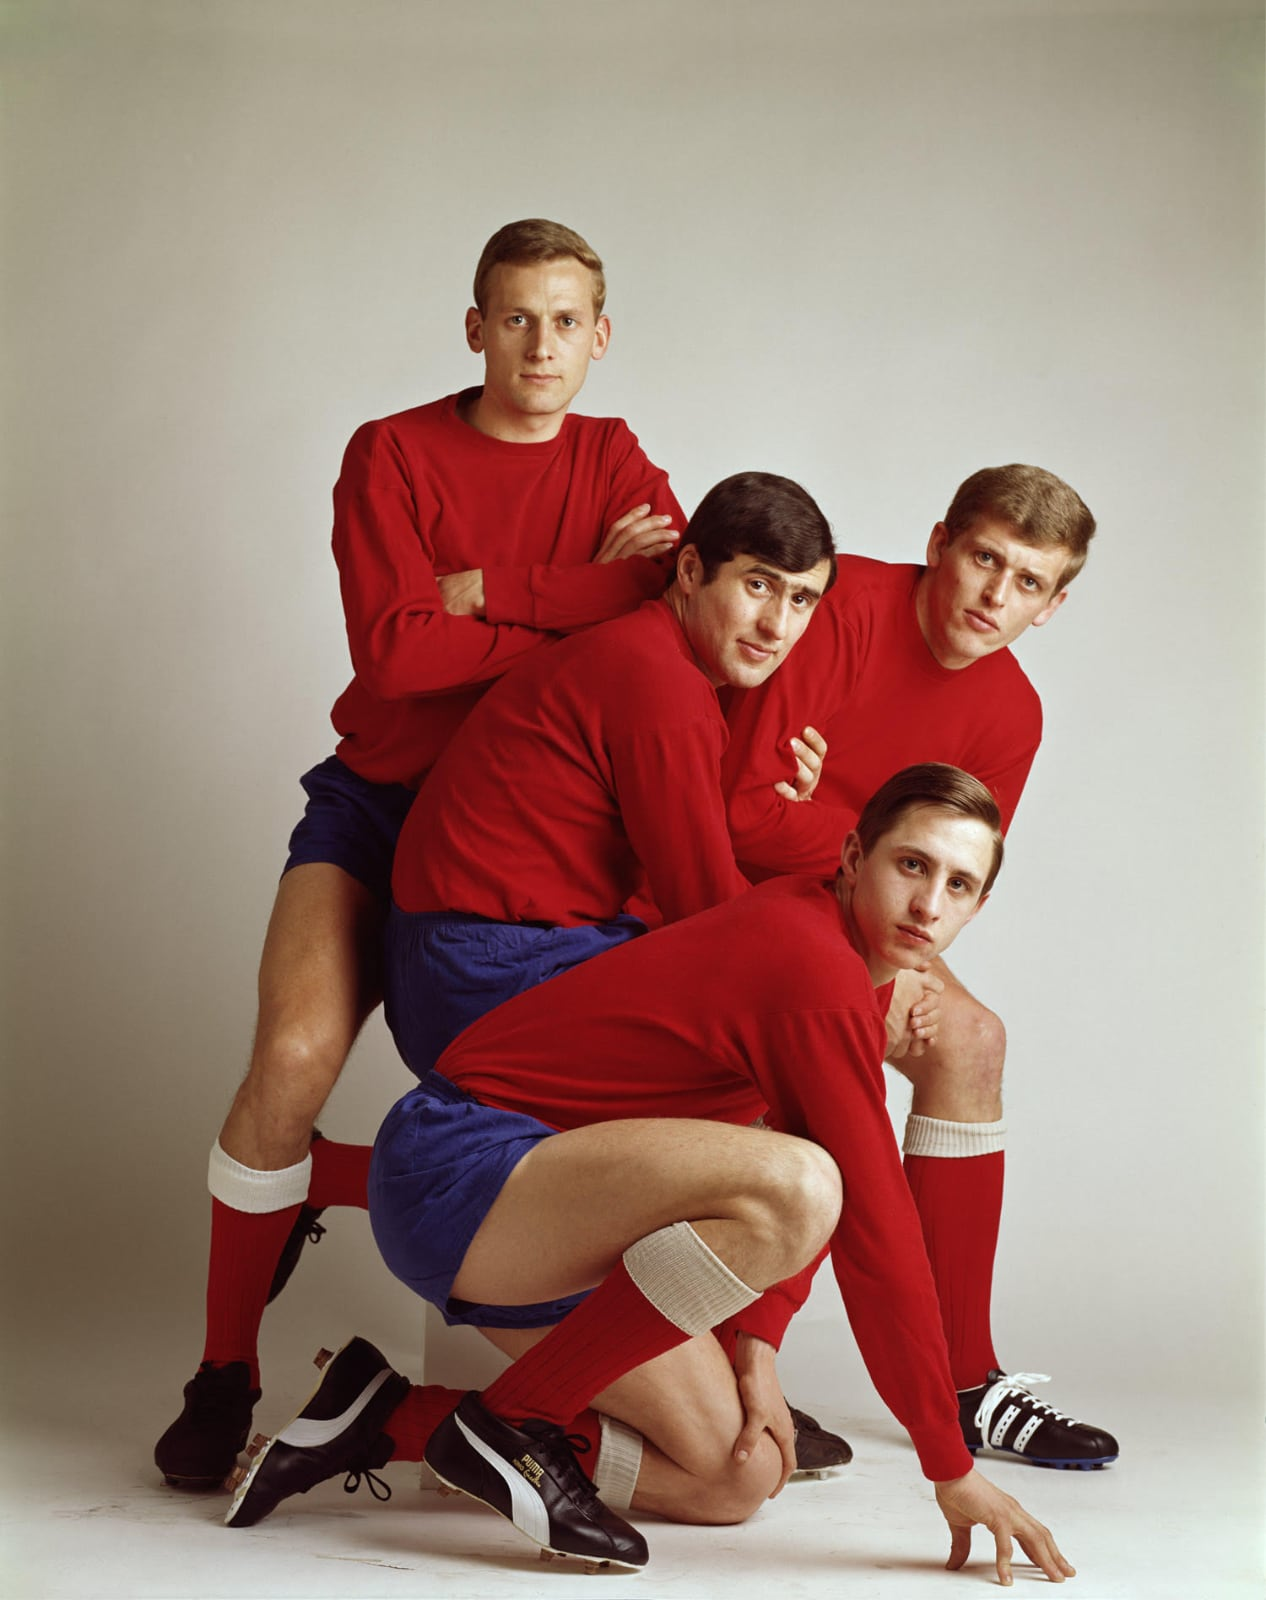 © Paul Huf/MAI - 1967, Ajax voetballers Johan Cruijff, Klaas Nuninga, Sjaak Swart en Piet Keizer